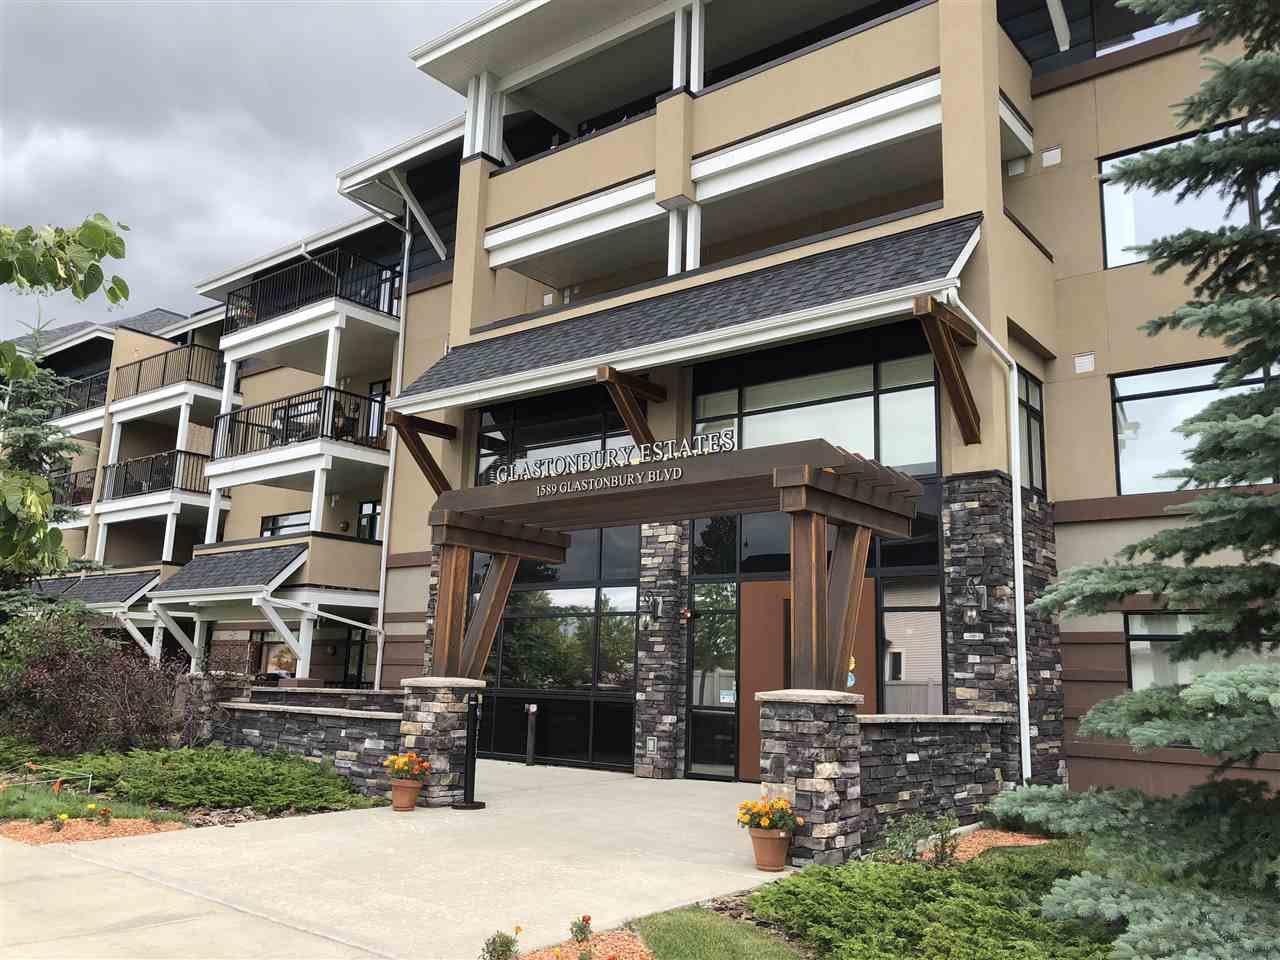 Main Photo: 410 1589 GLASTONBURY Boulevard in Edmonton: Zone 58 Condo for sale : MLS®# E4170557